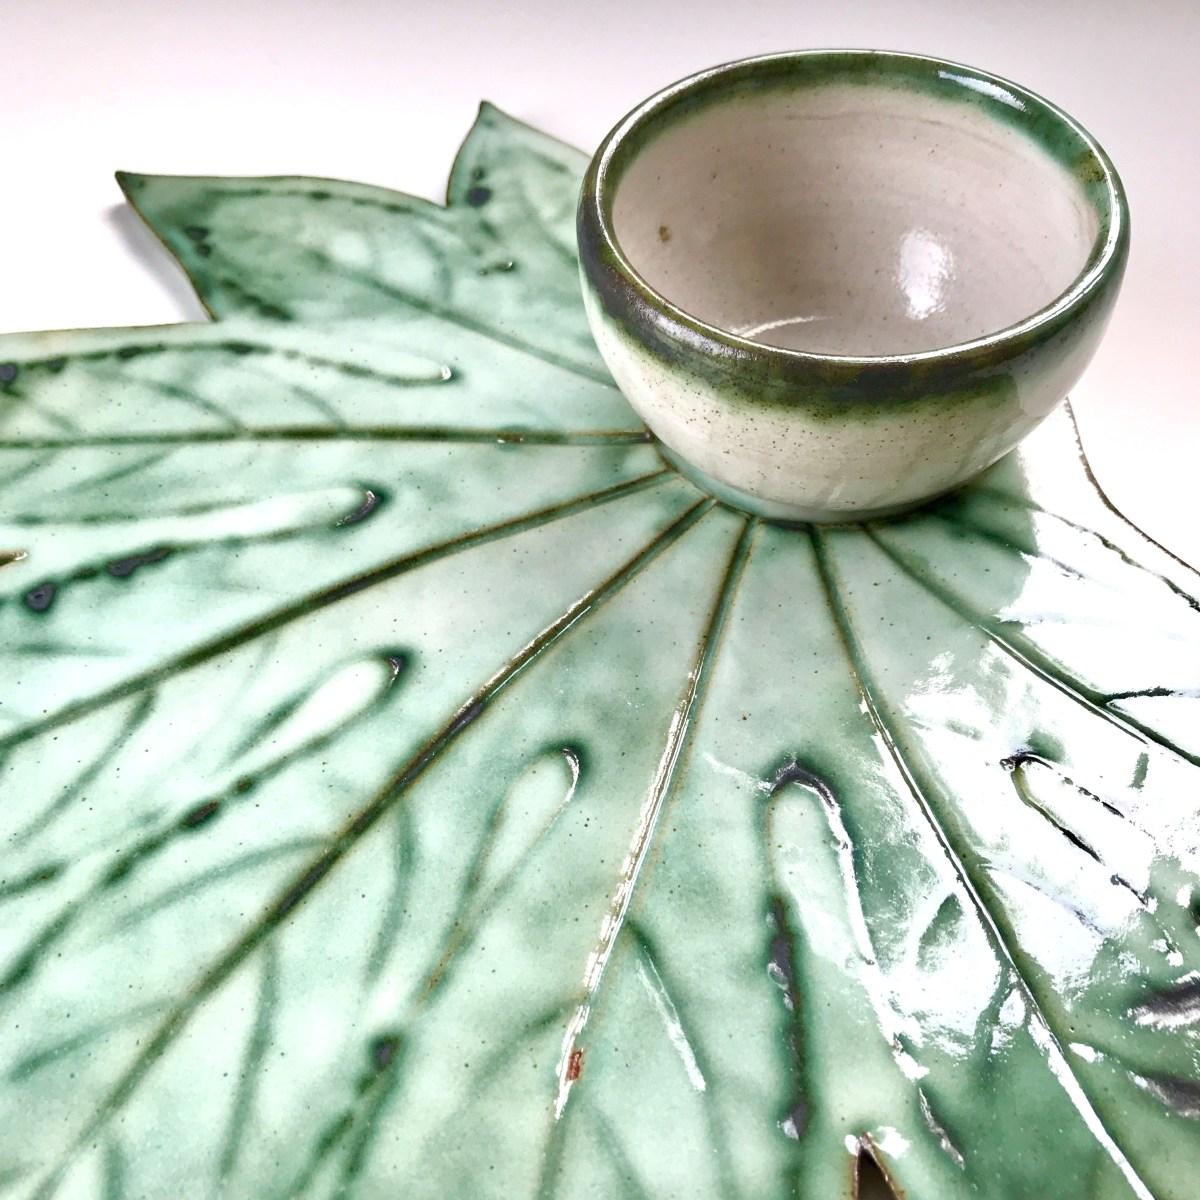 Fatsia Leaf Sharing Platter & Condiment Bowl by Sonya Ceramic Art (Bowl Close Up View)